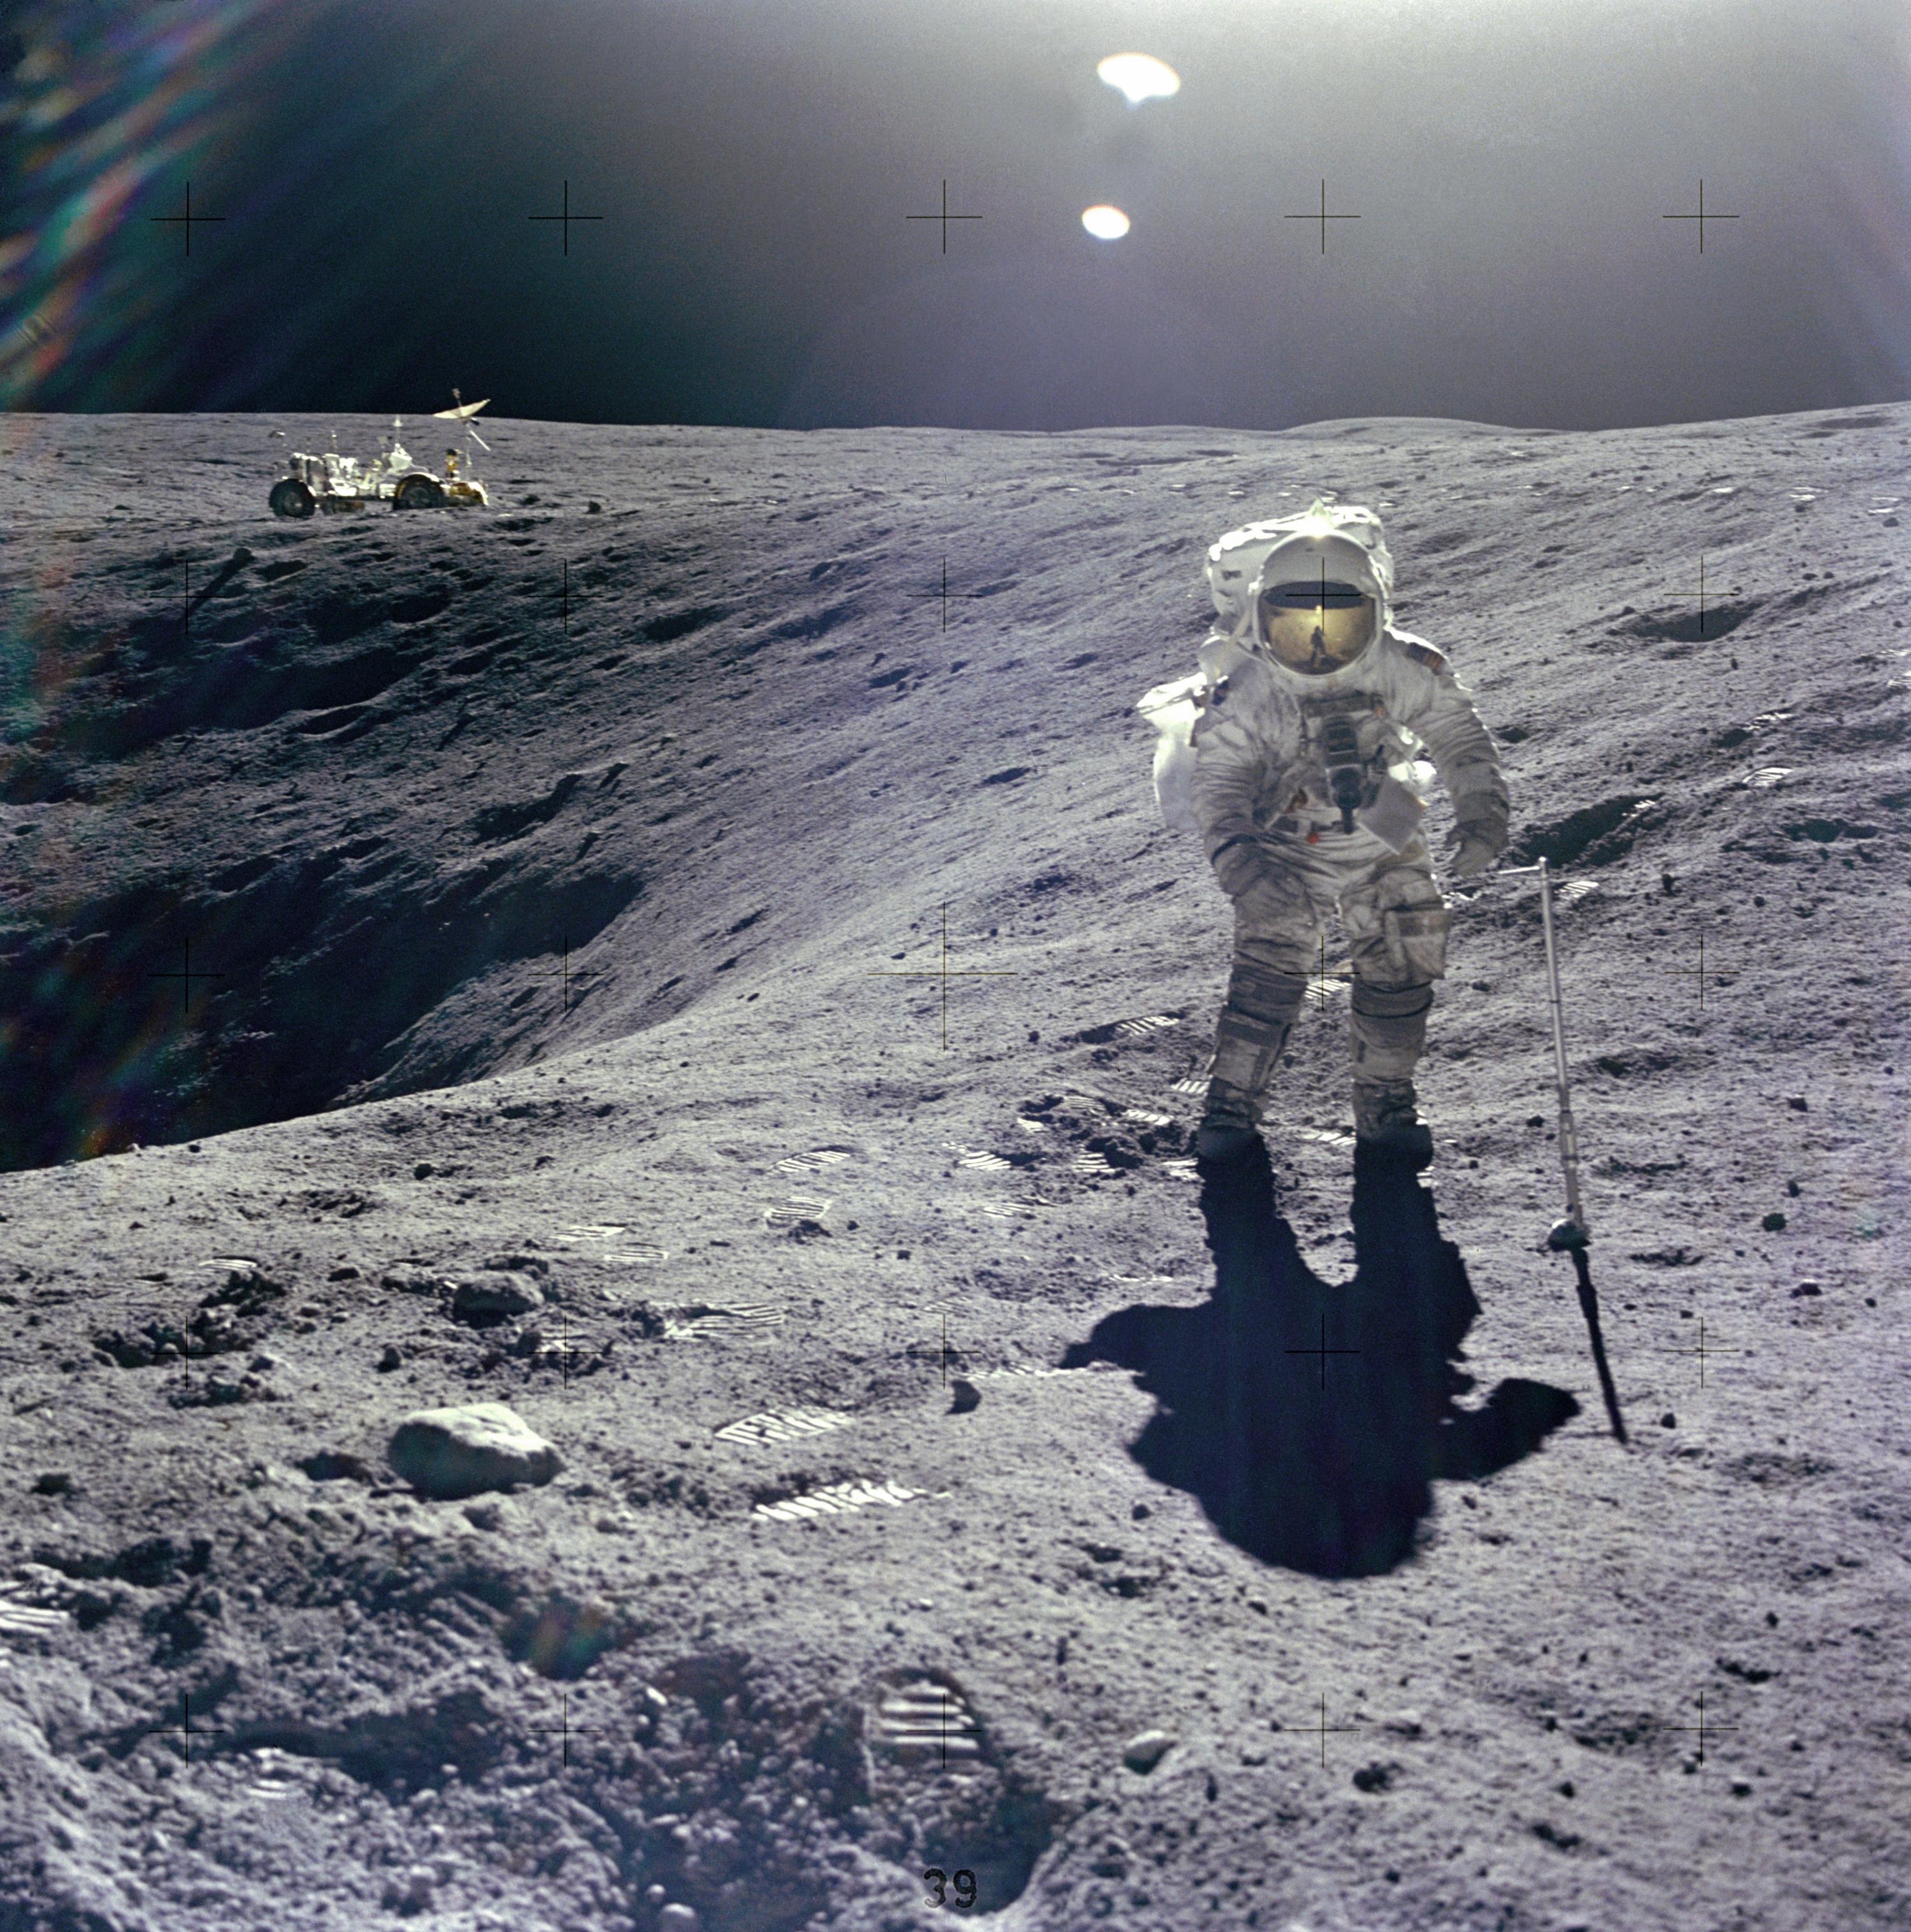 Astronaut Charles M. Duke Jr., Lunar Module pilot of the Apollo 16 mission, collecting lunar samples.